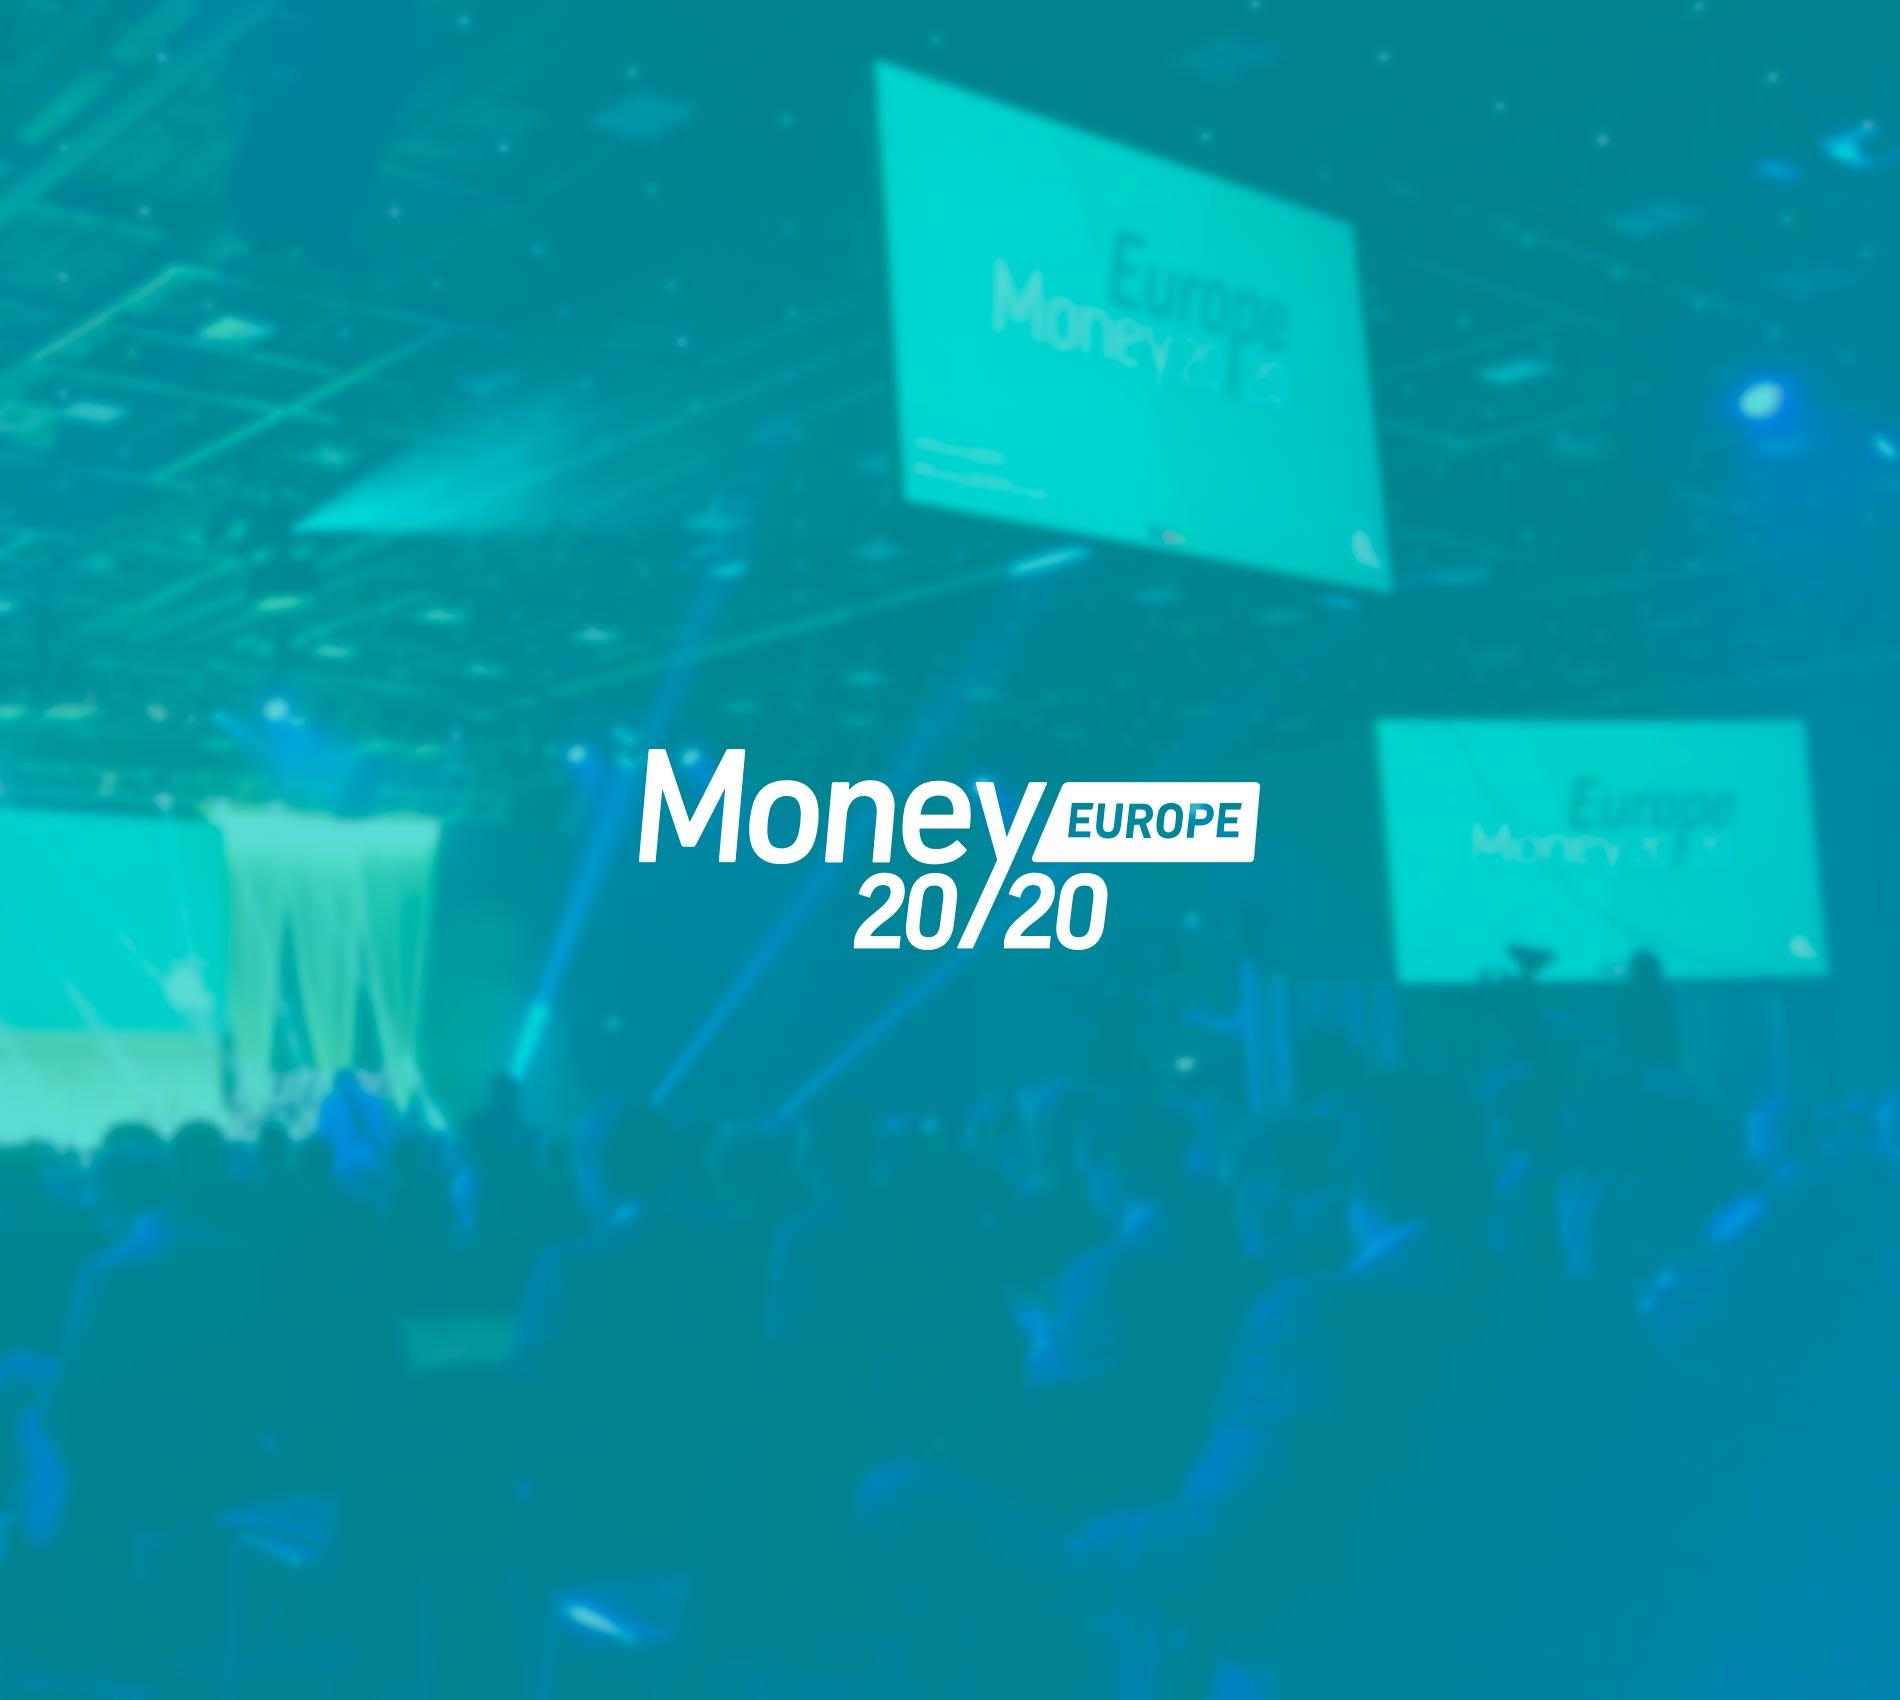 Europe Money 20/20 Europe 2017, Copenhagen